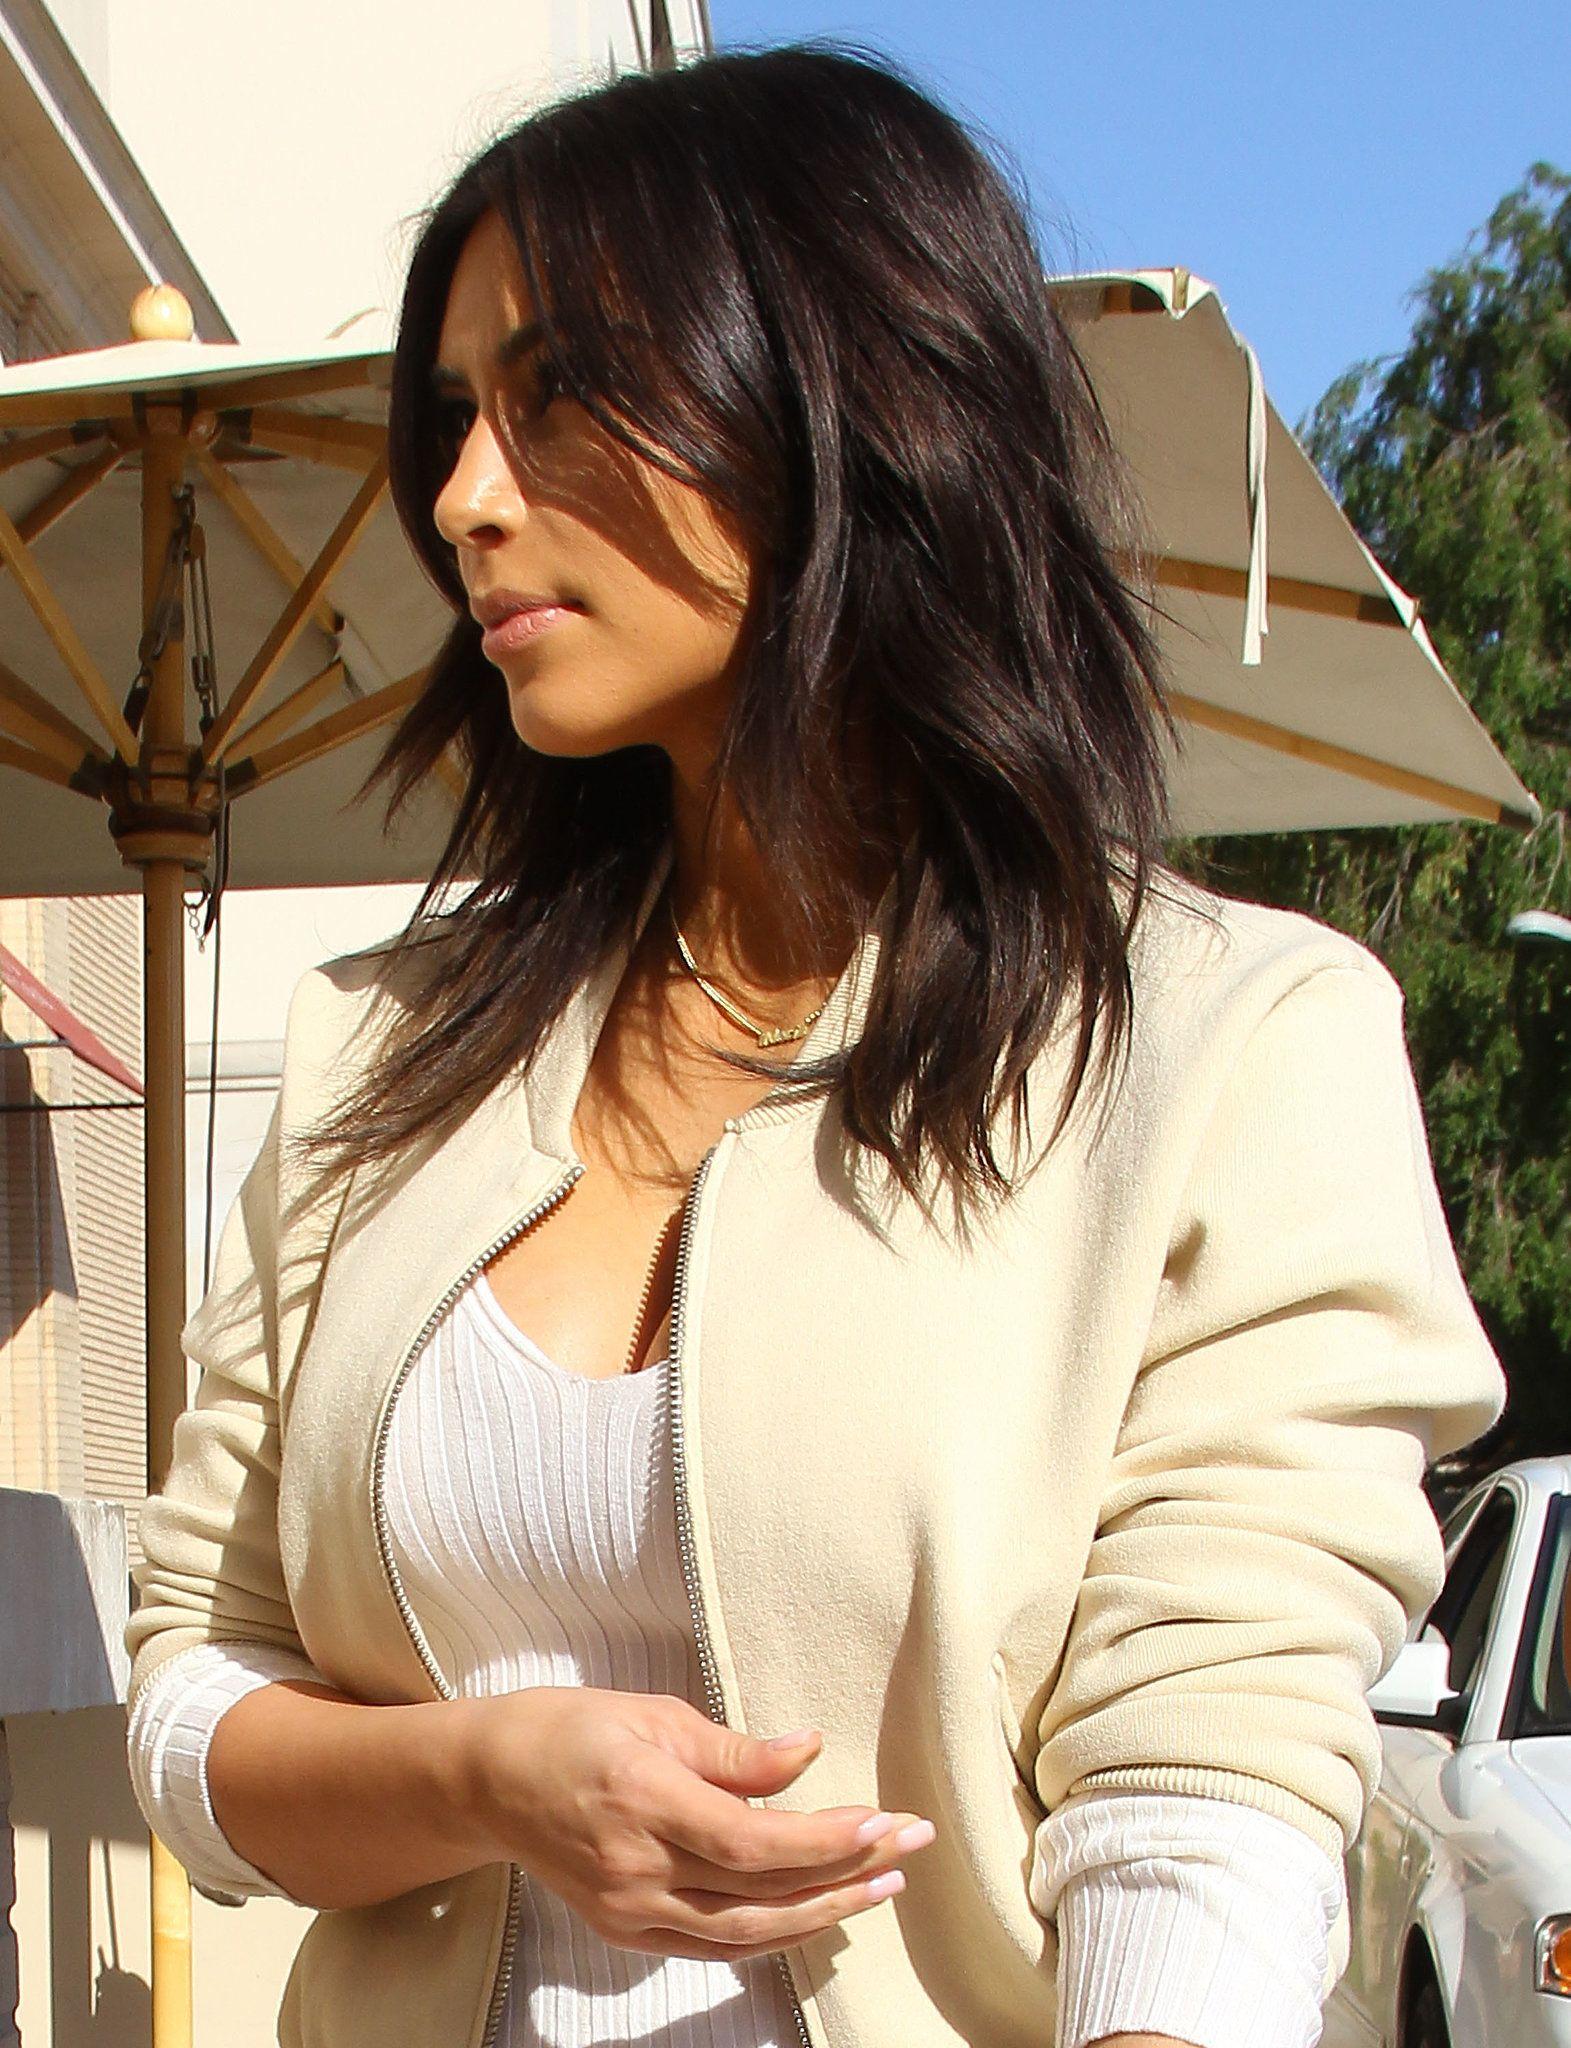 Makeup Beauty Hair Skin Do You Like Kim Kardashian S Shaggy New Layered Haircut Hair Styles Medium Hair Styles Long Hair Styles